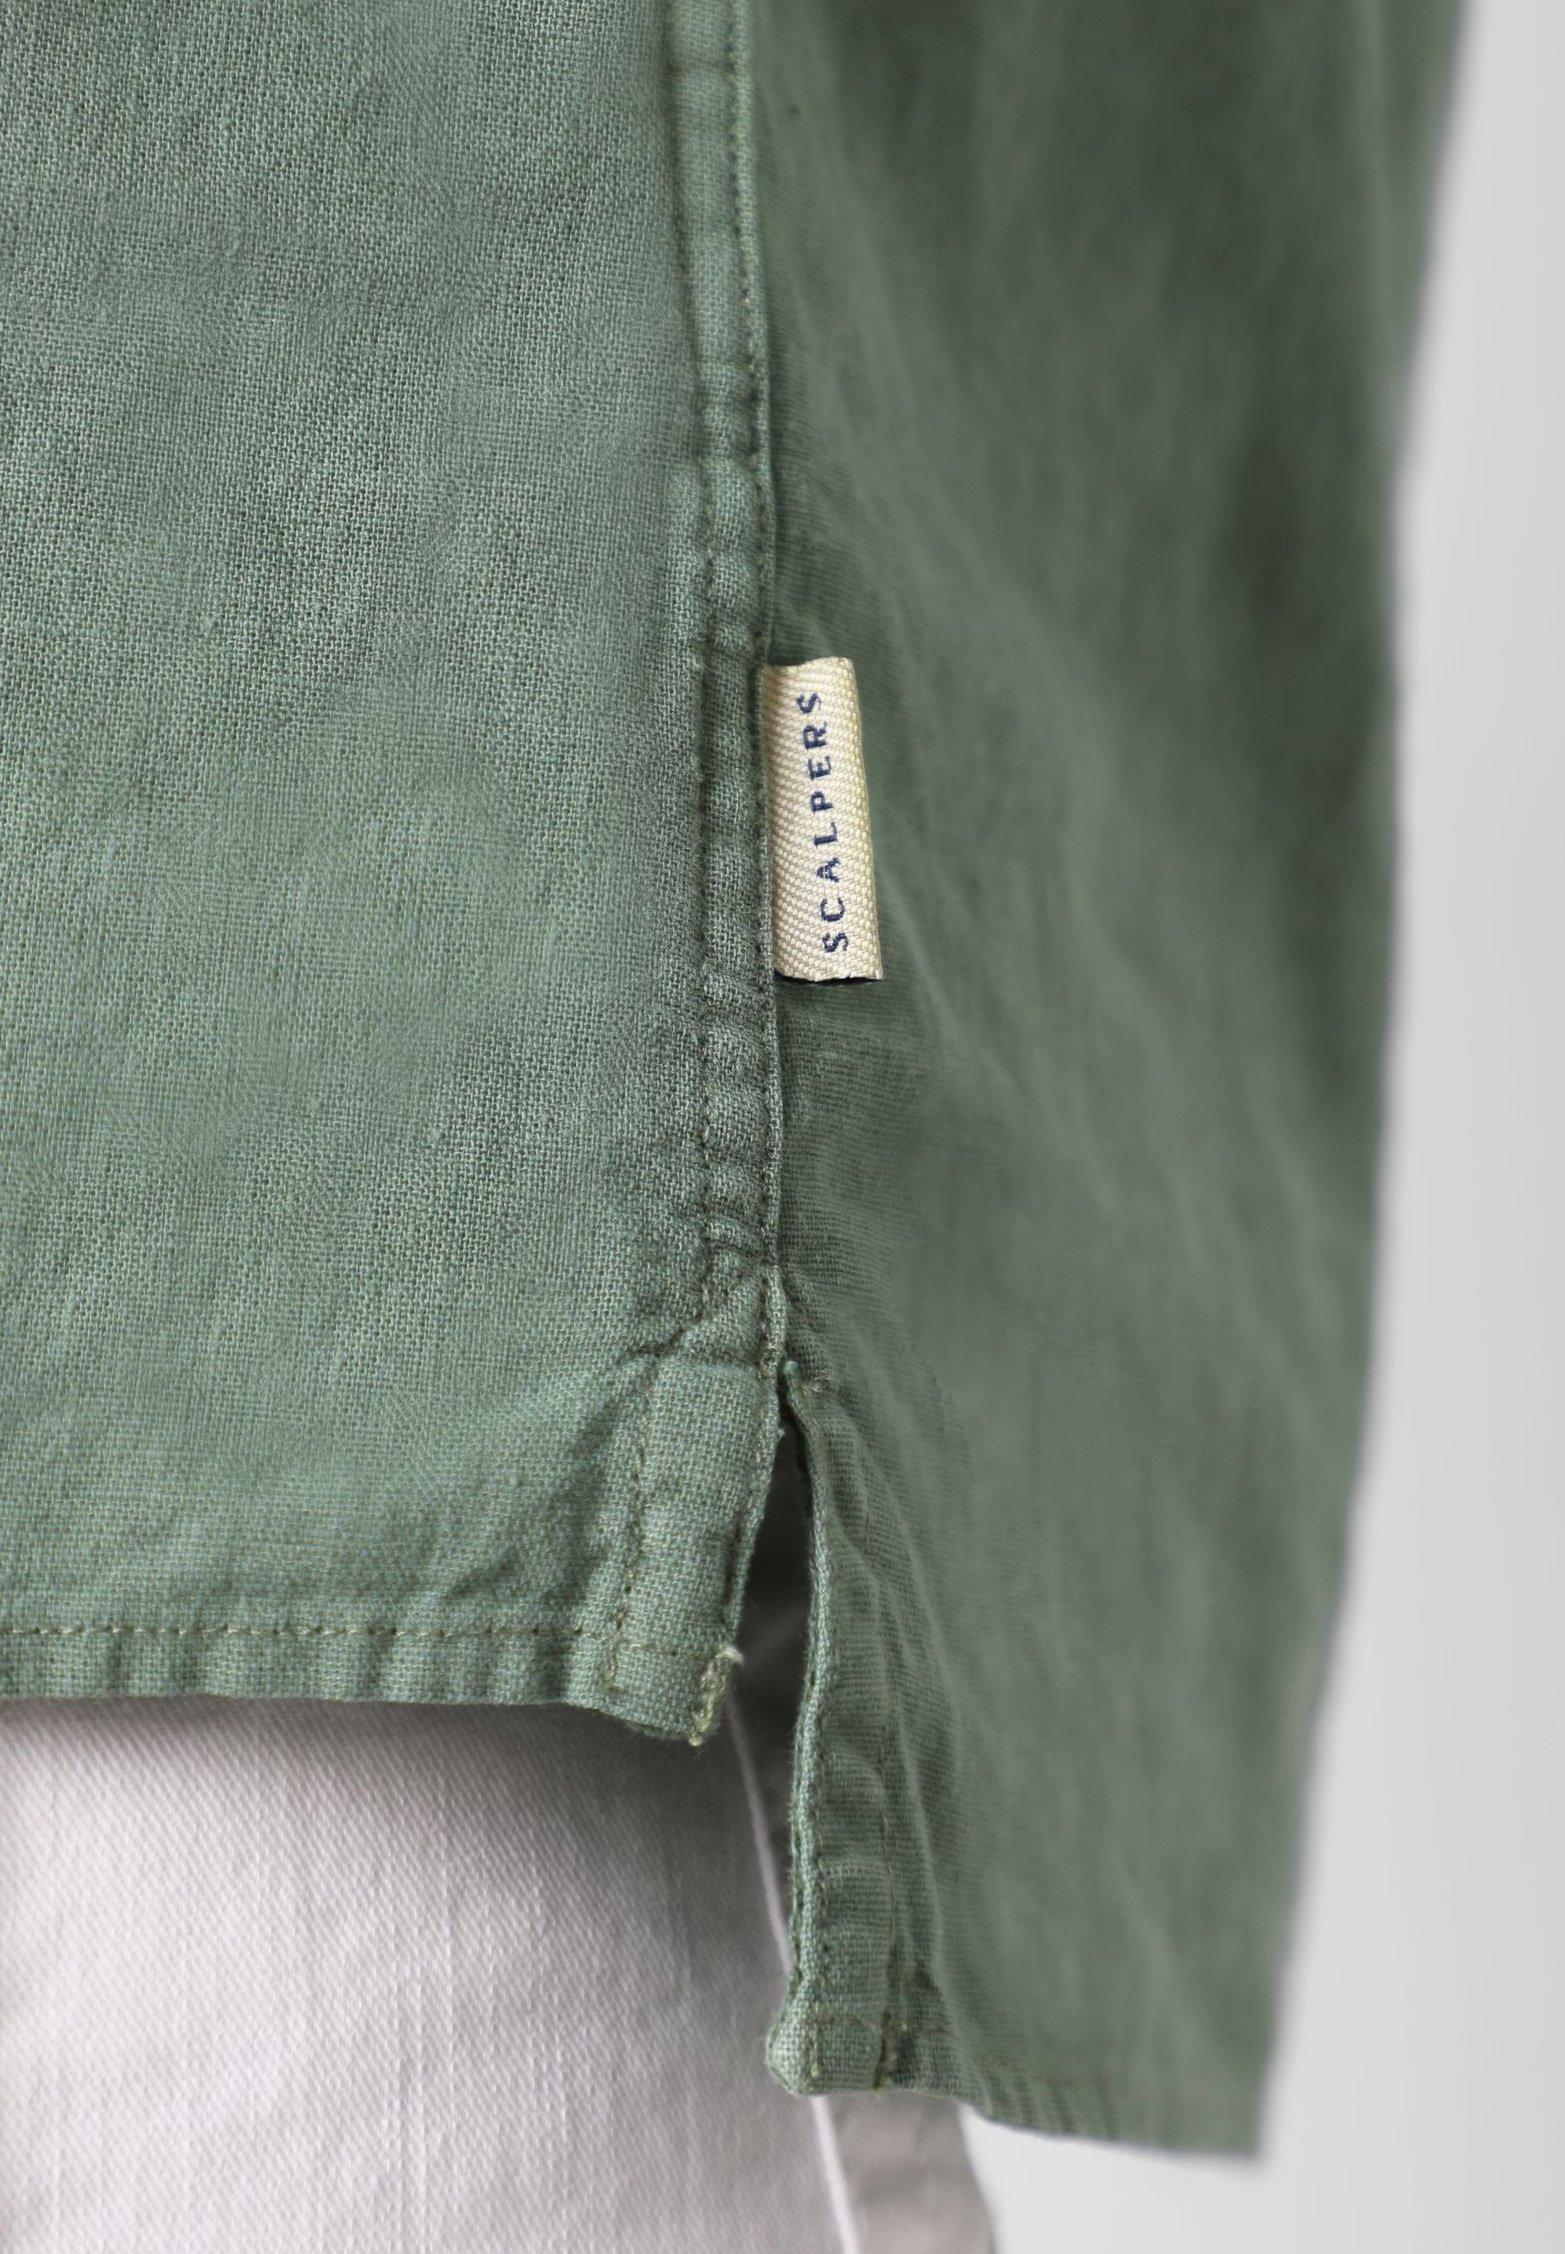 chemise kaporal homme kaki zippé zalando